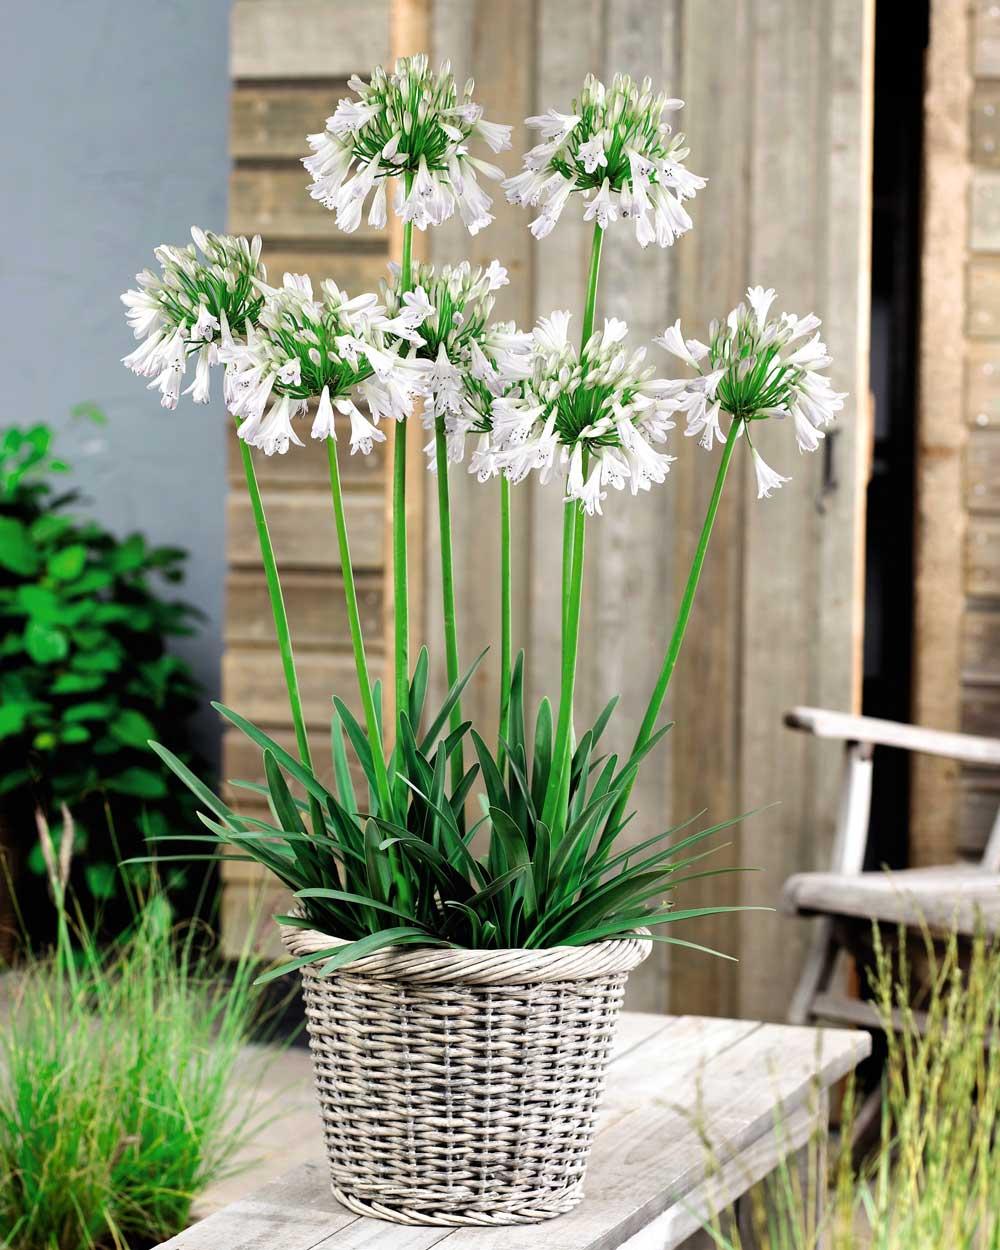 Agapanthus-Silver-Lining-in-basket